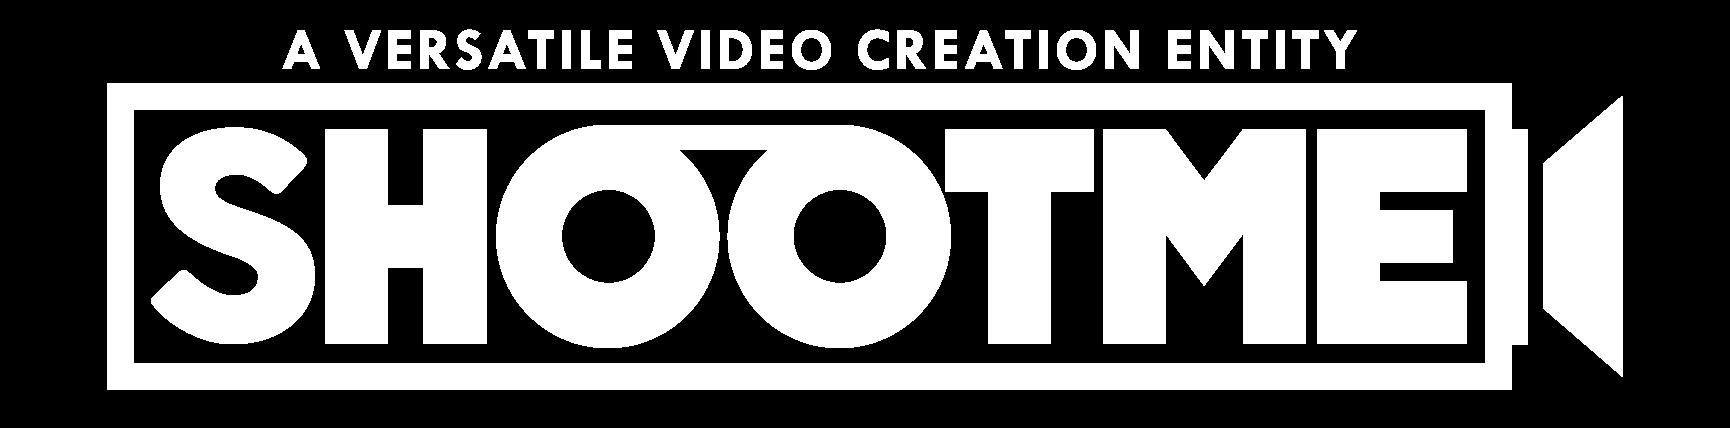 shootme logo